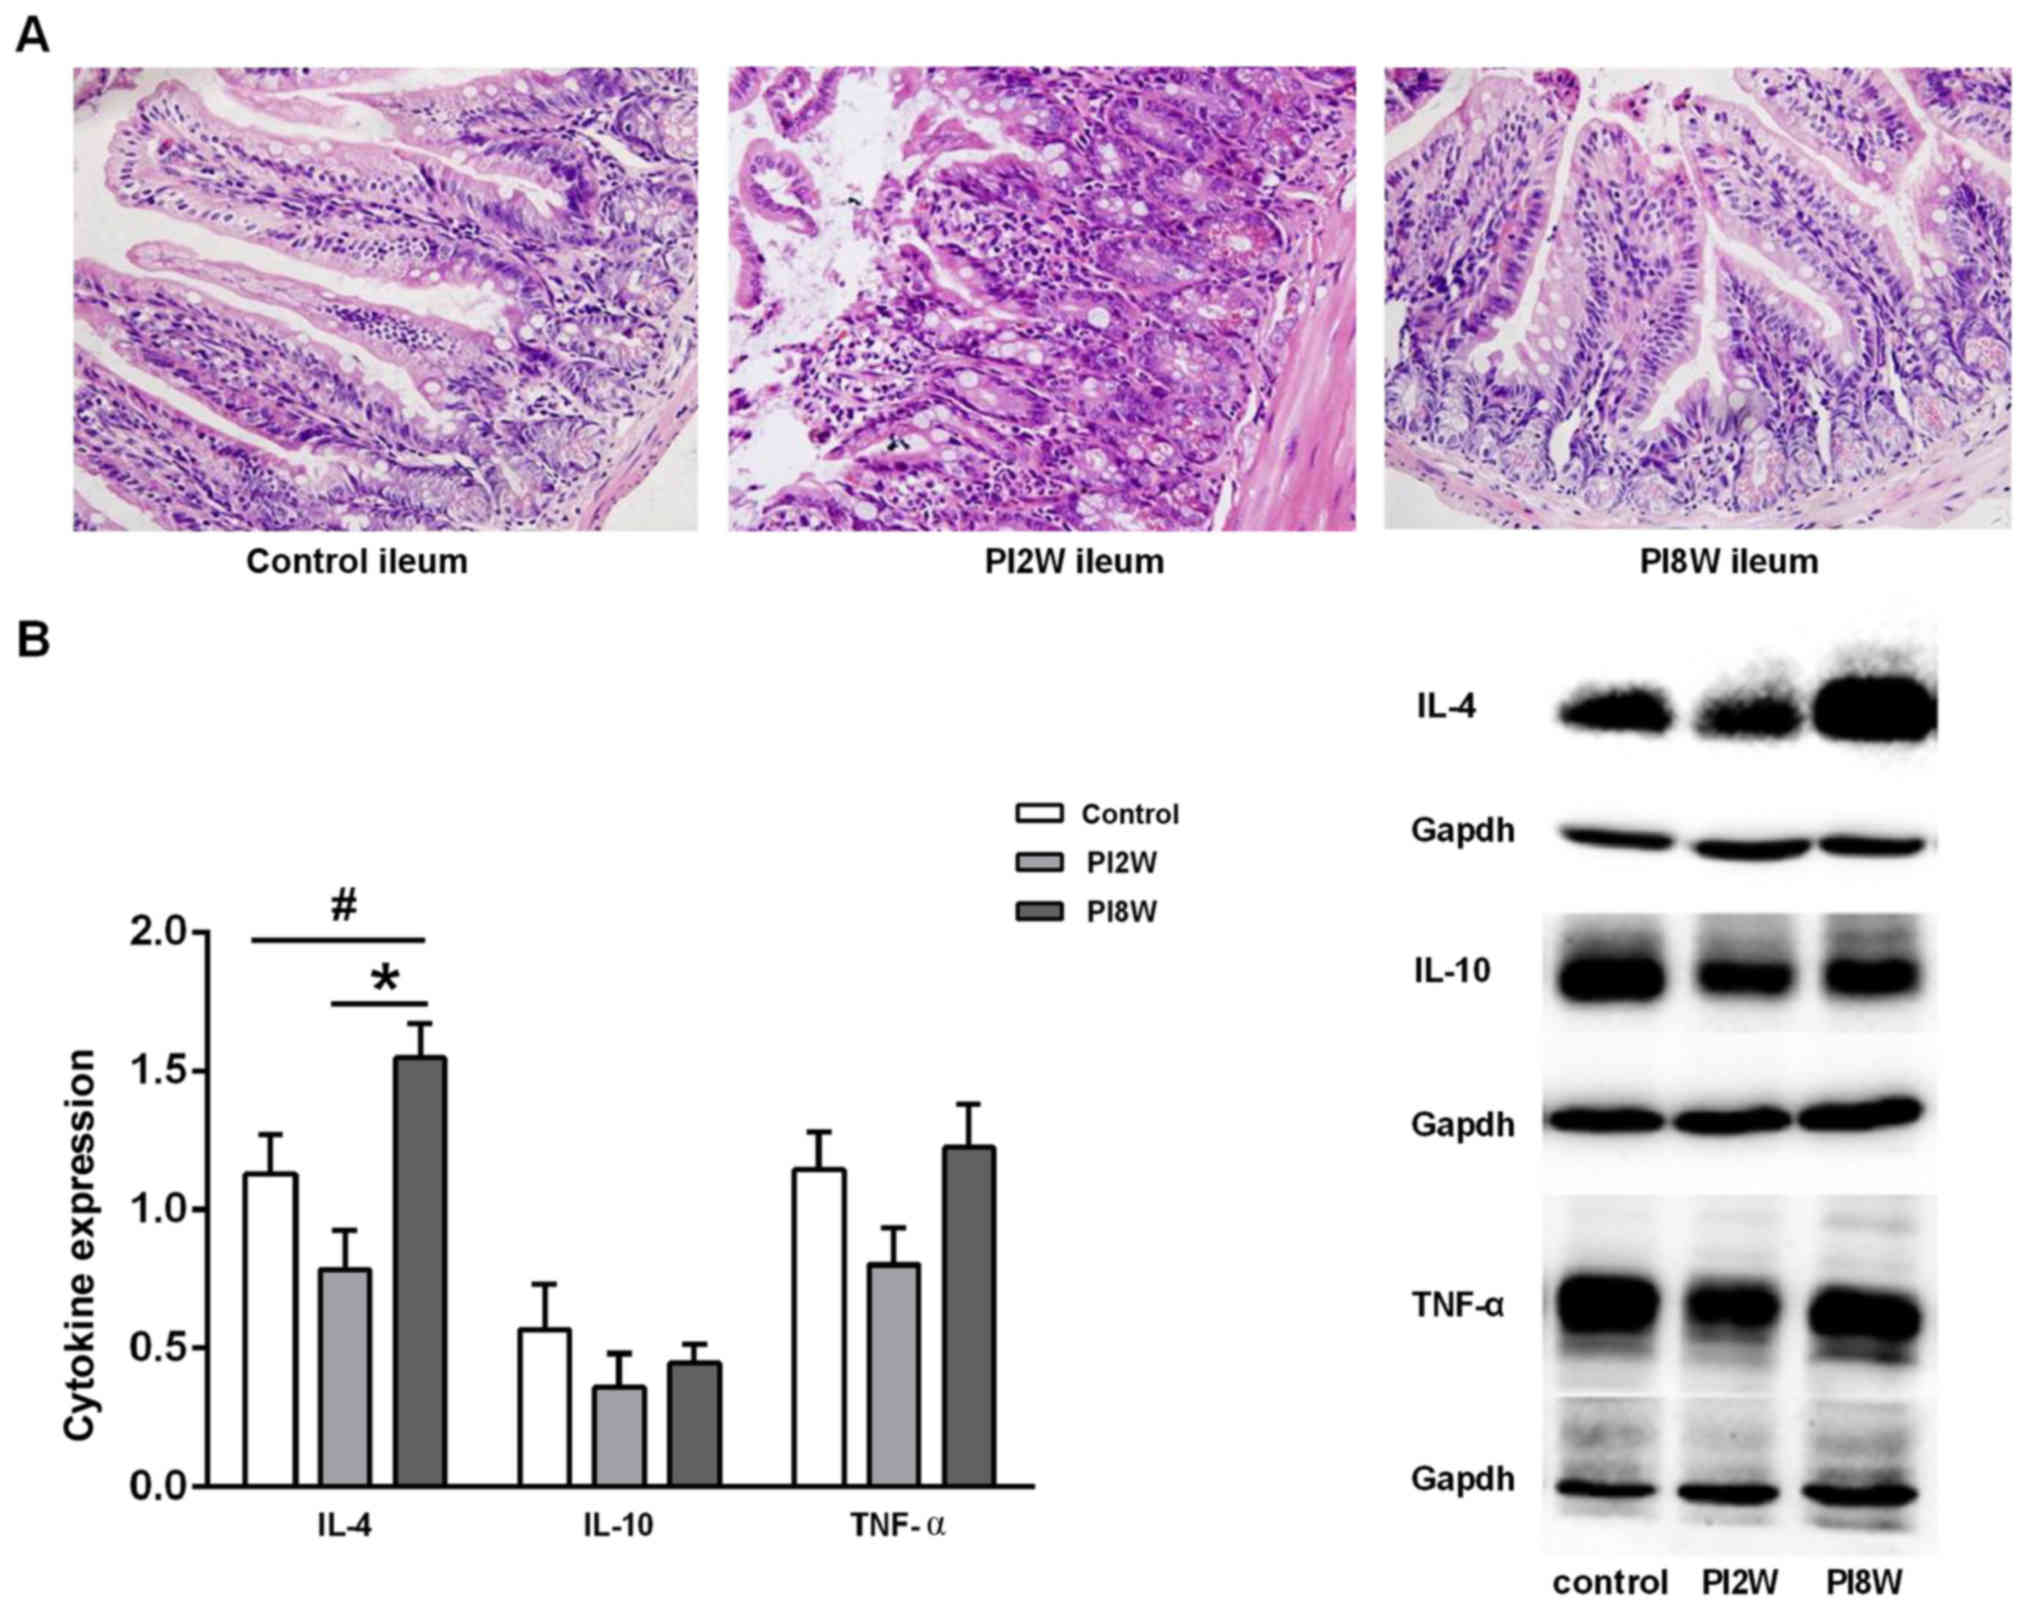 Transfer of CD11c+ lamina propria mononuclear phagocytes